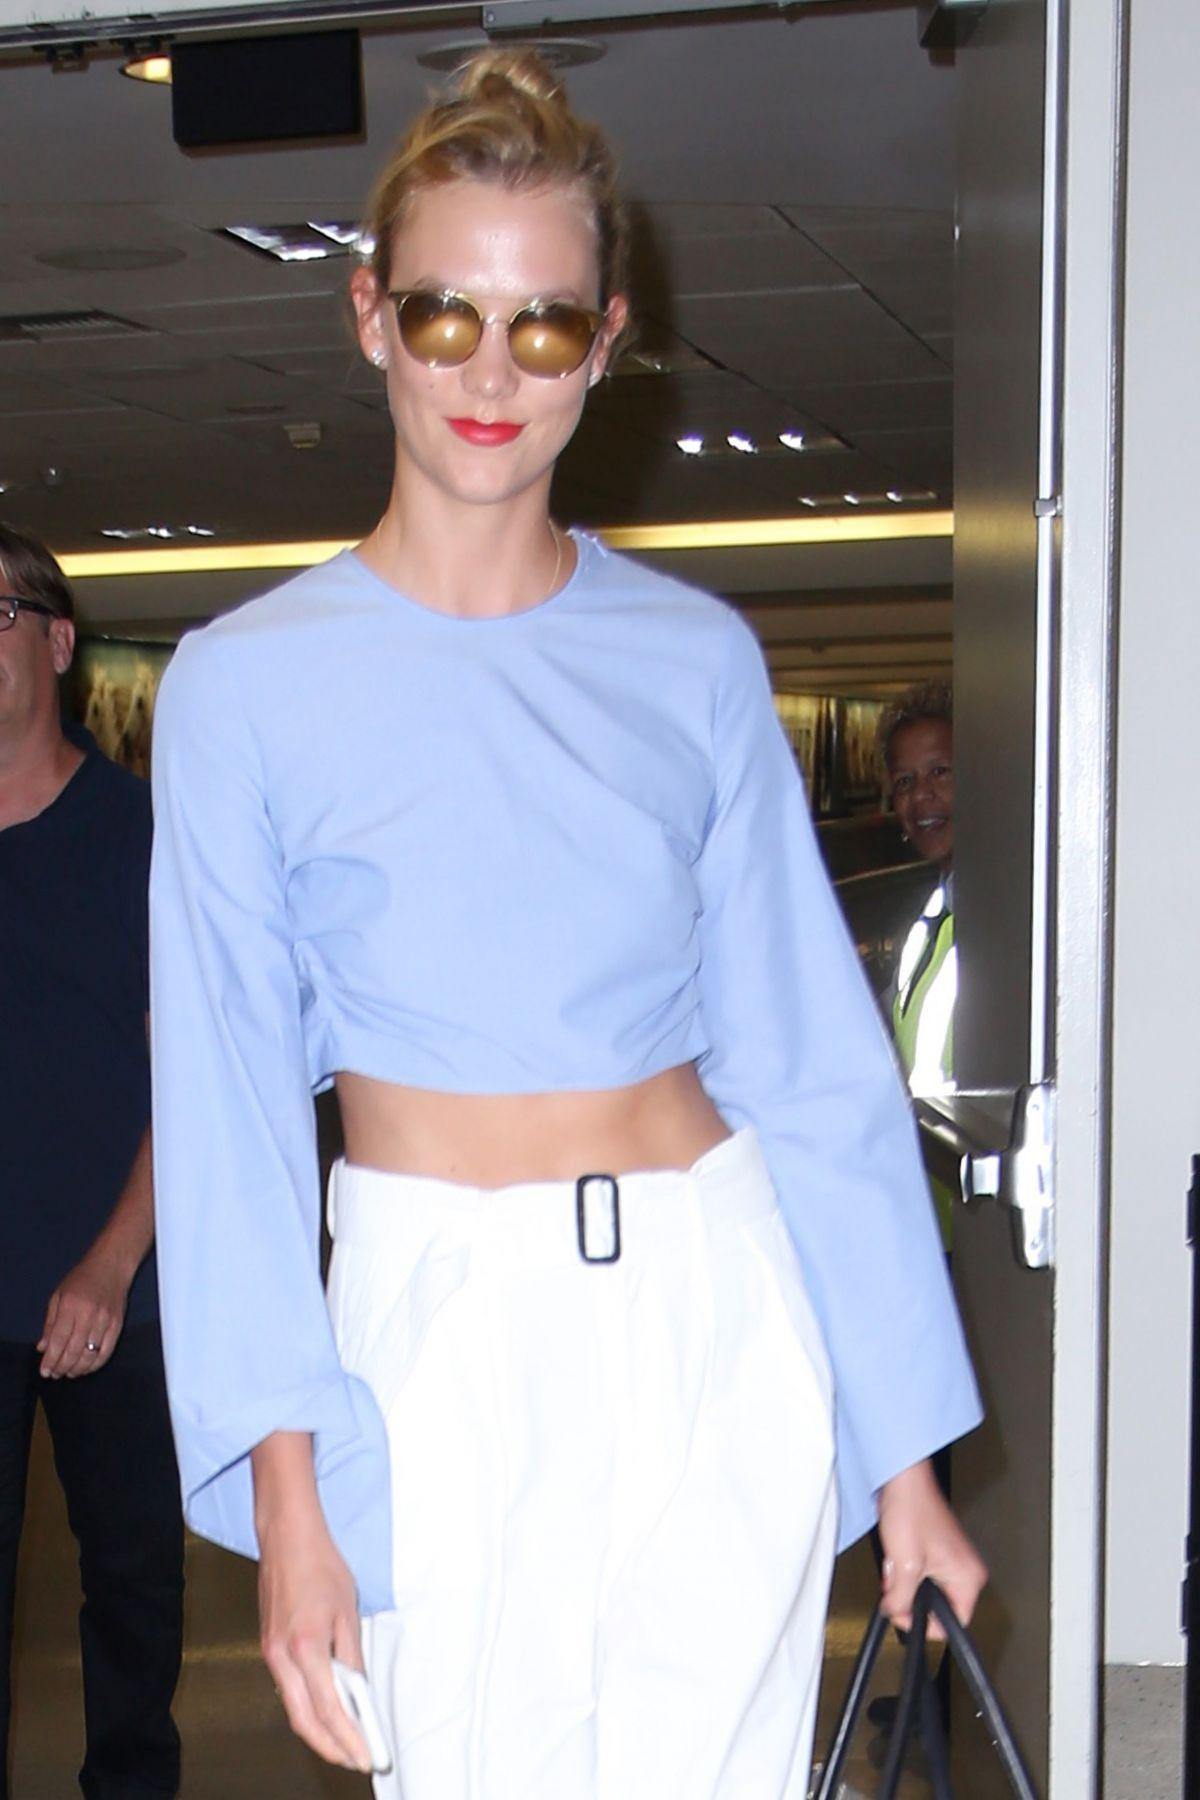 KARLIE KLOSS at Los Angeles International Airport 08/16/2016